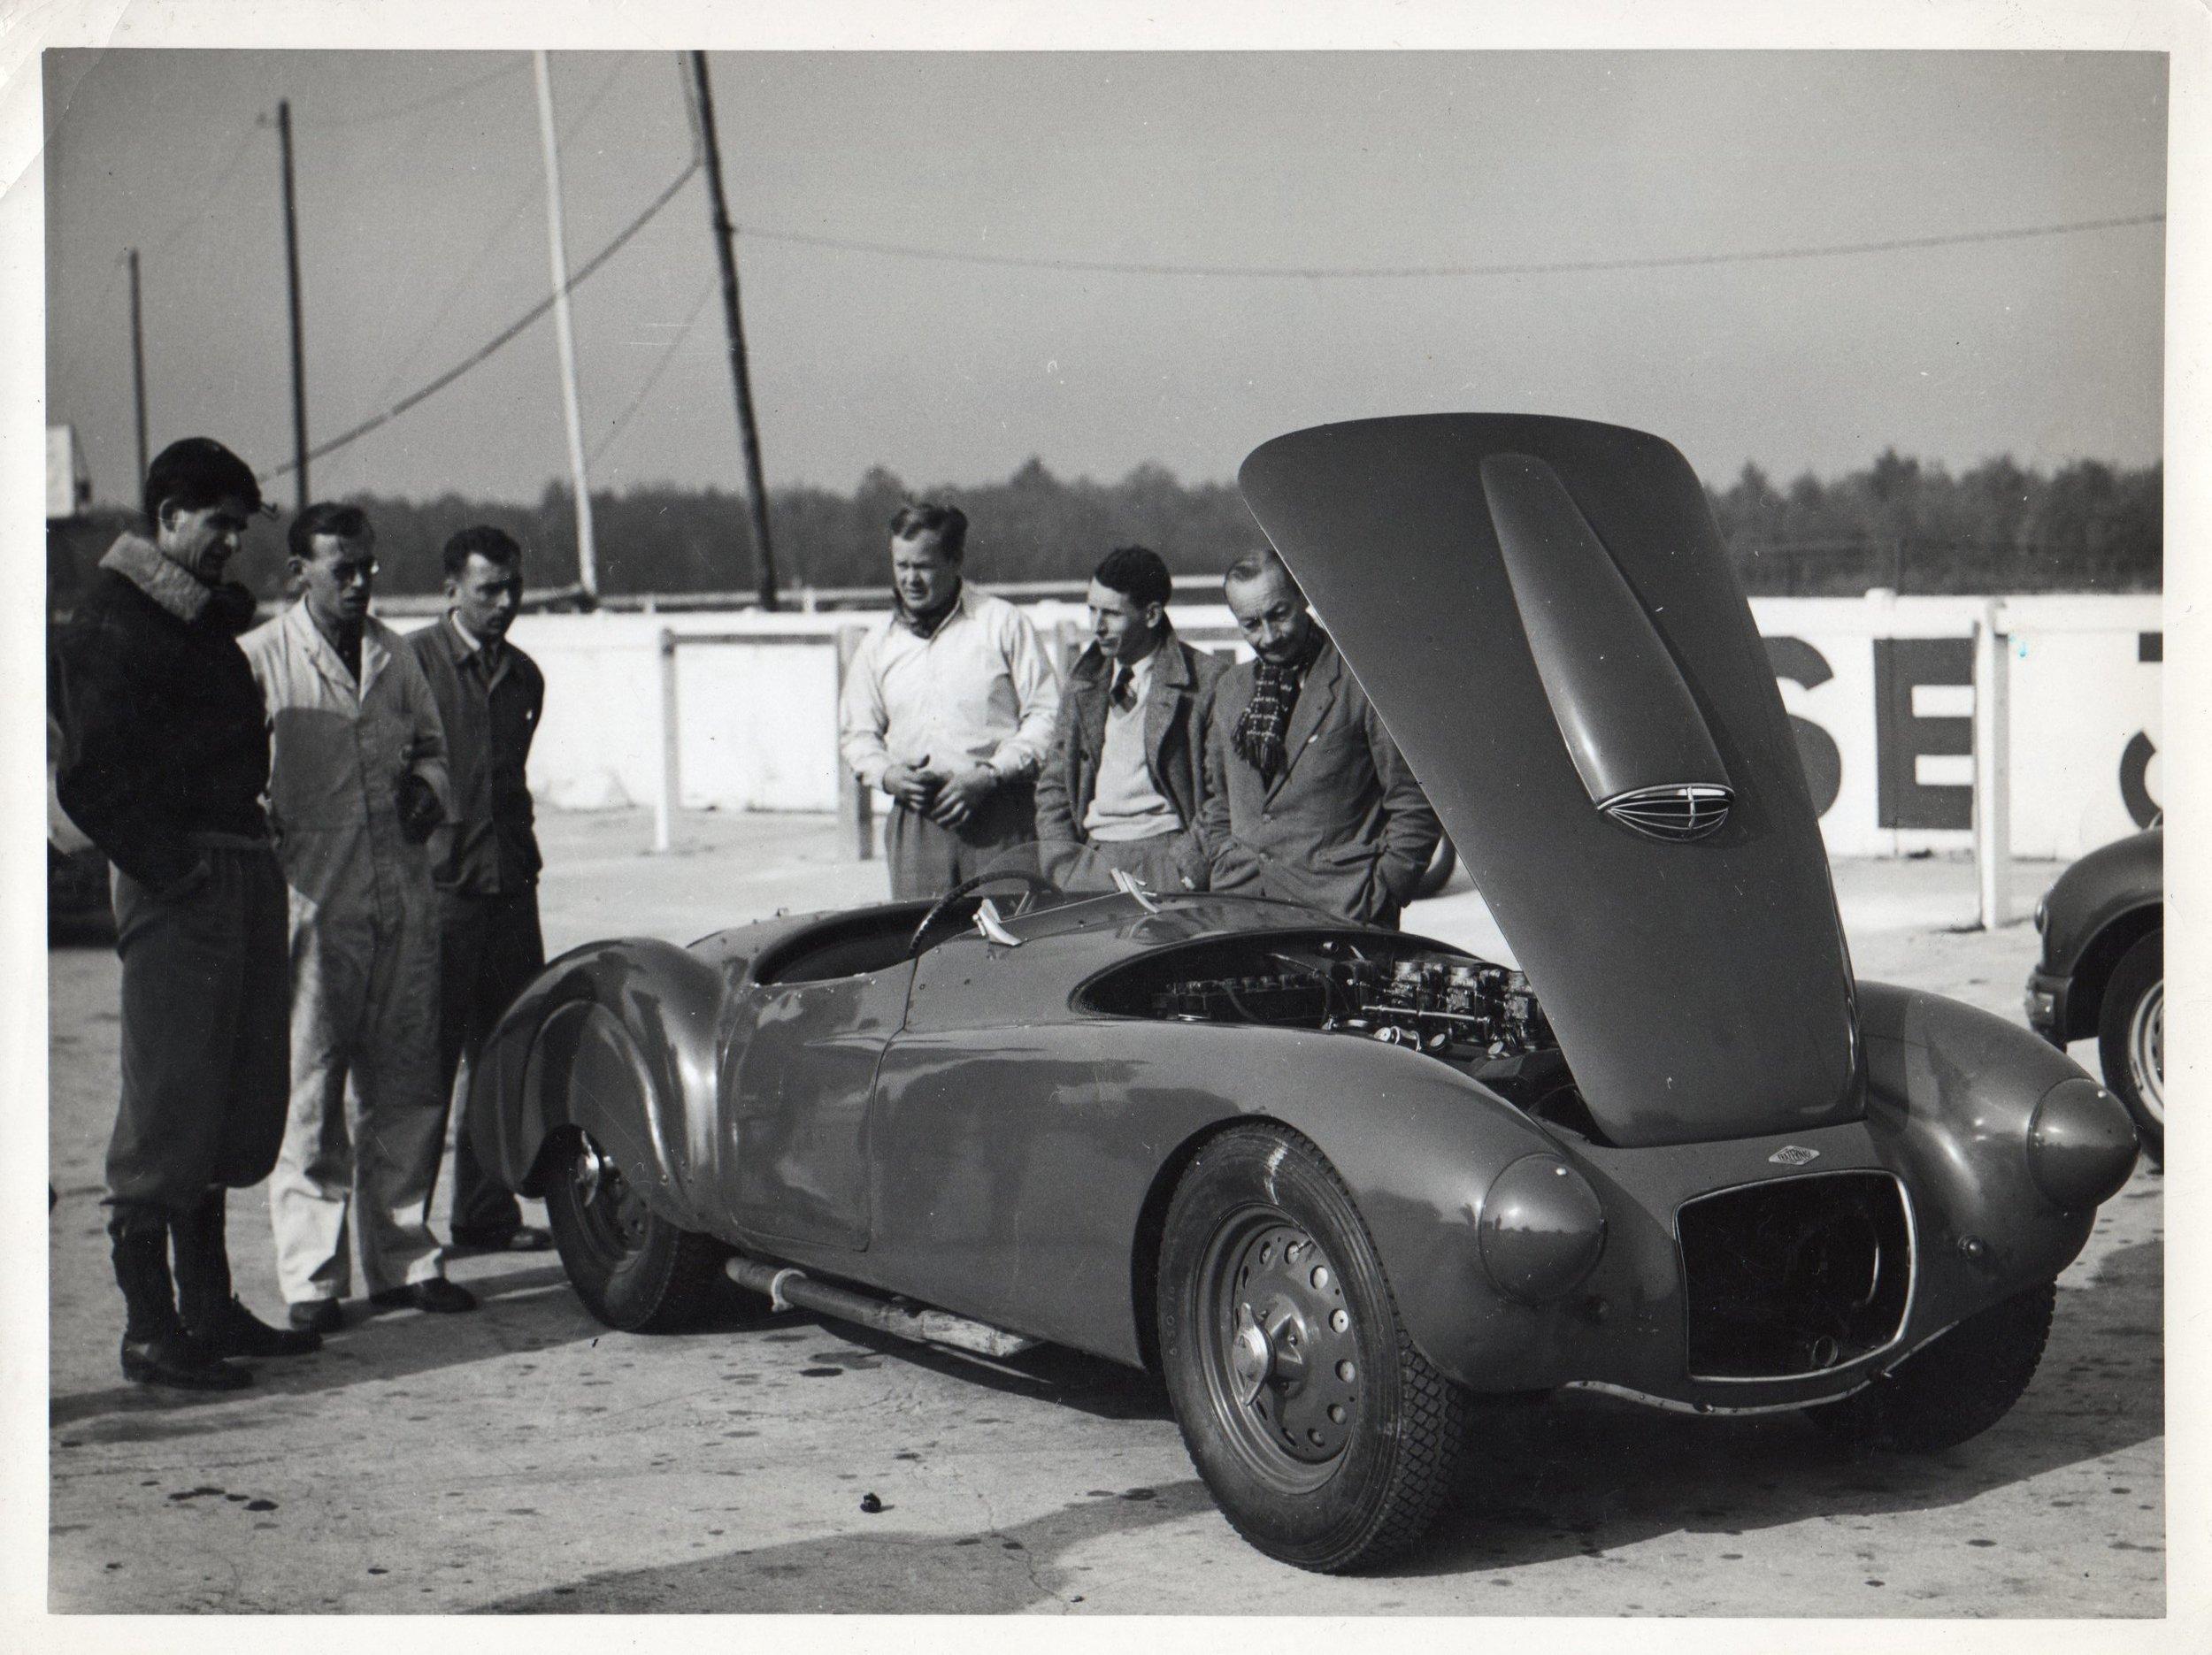 Crook (in WWII jacket), John Dennis, Dunlop representative, mechanic, James Manfield, French timekeeper